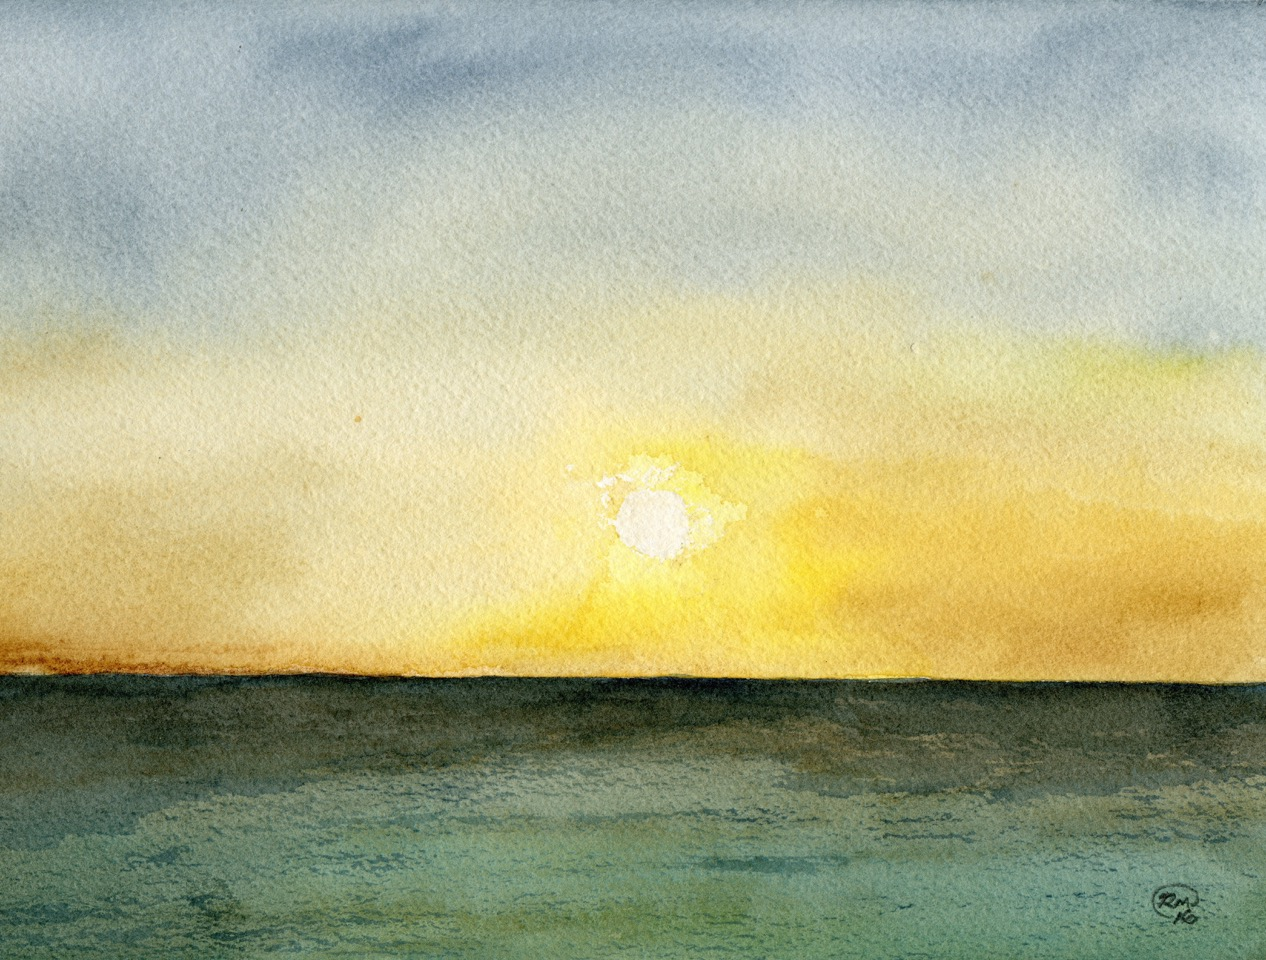 Playa Mar 1